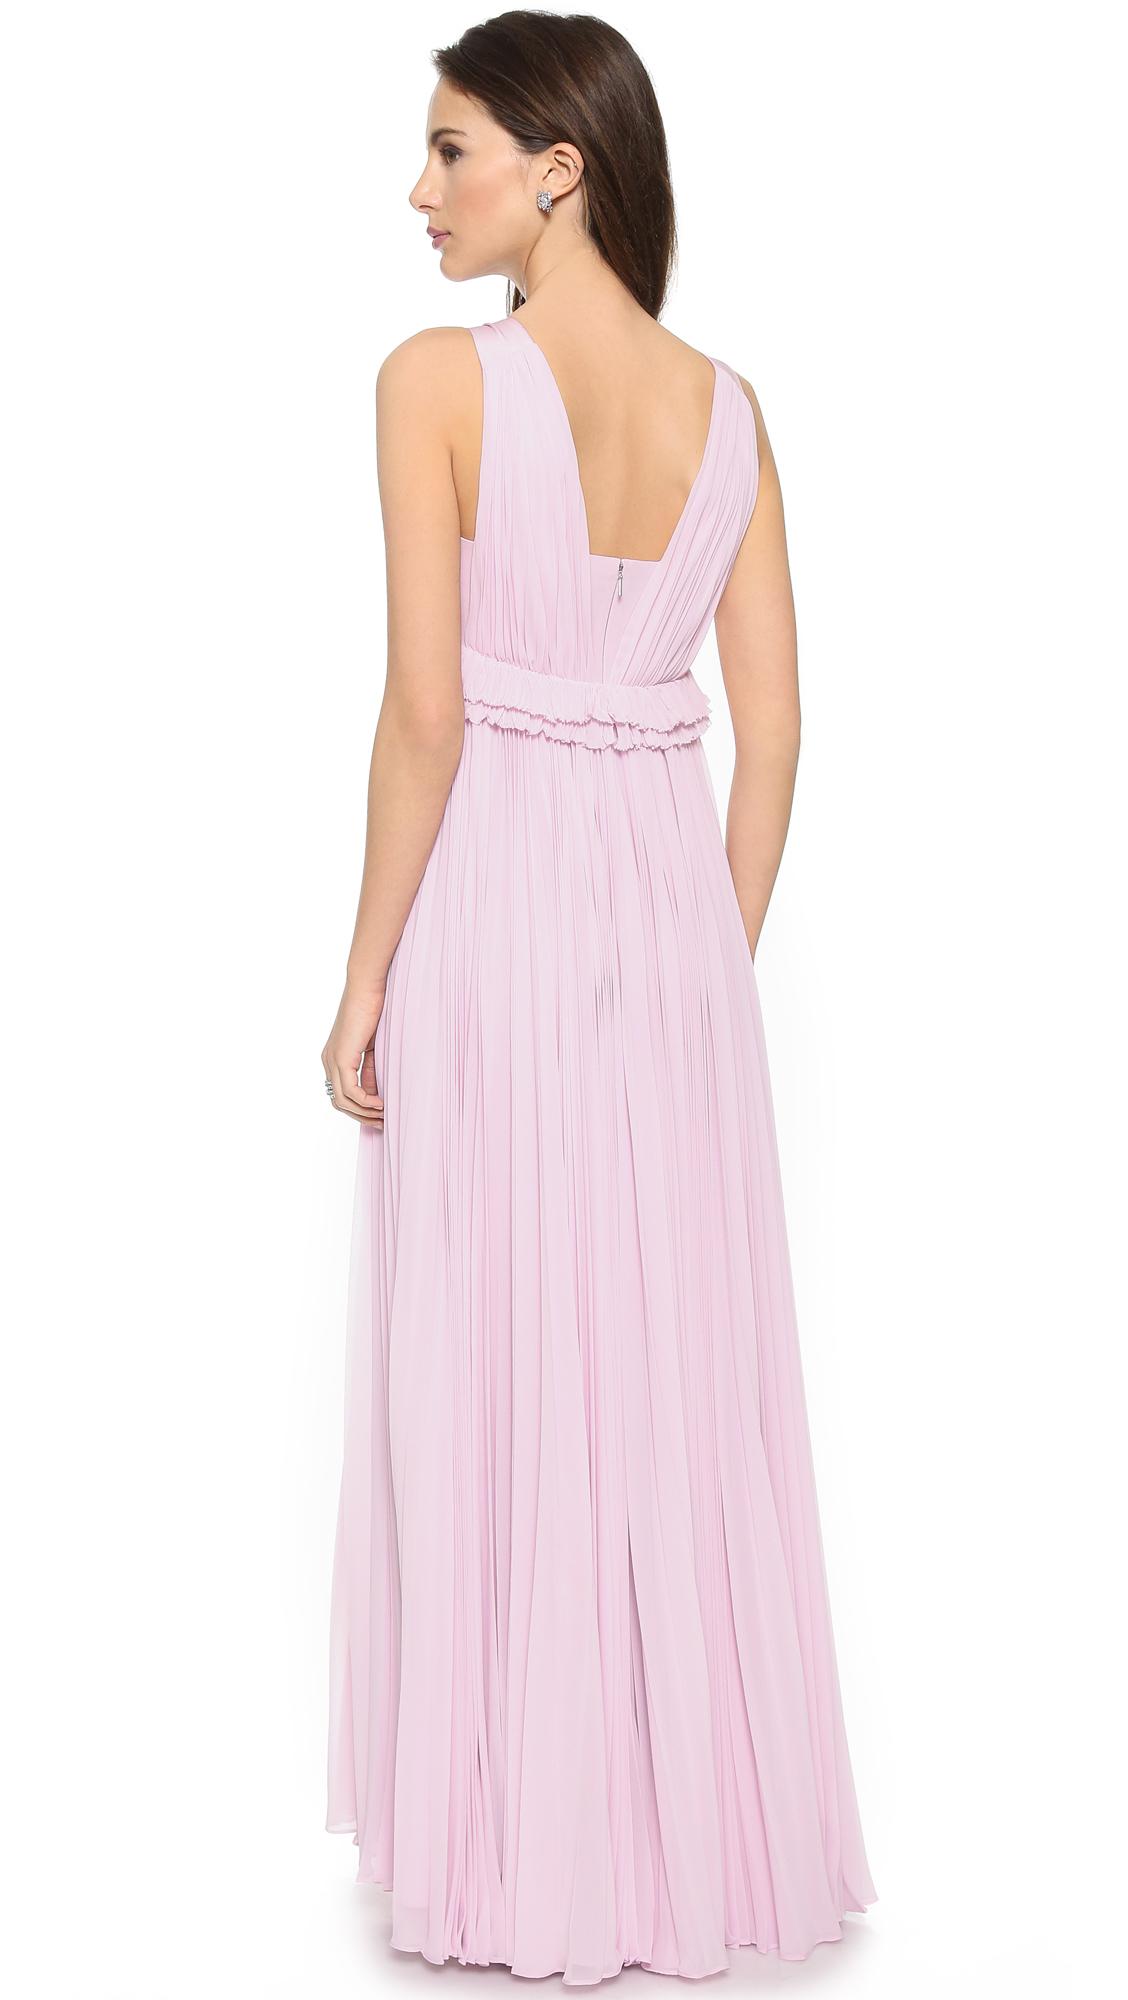 Lyst - Rebecca Taylor Chiffon Pleat Gown - Lilac in Purple